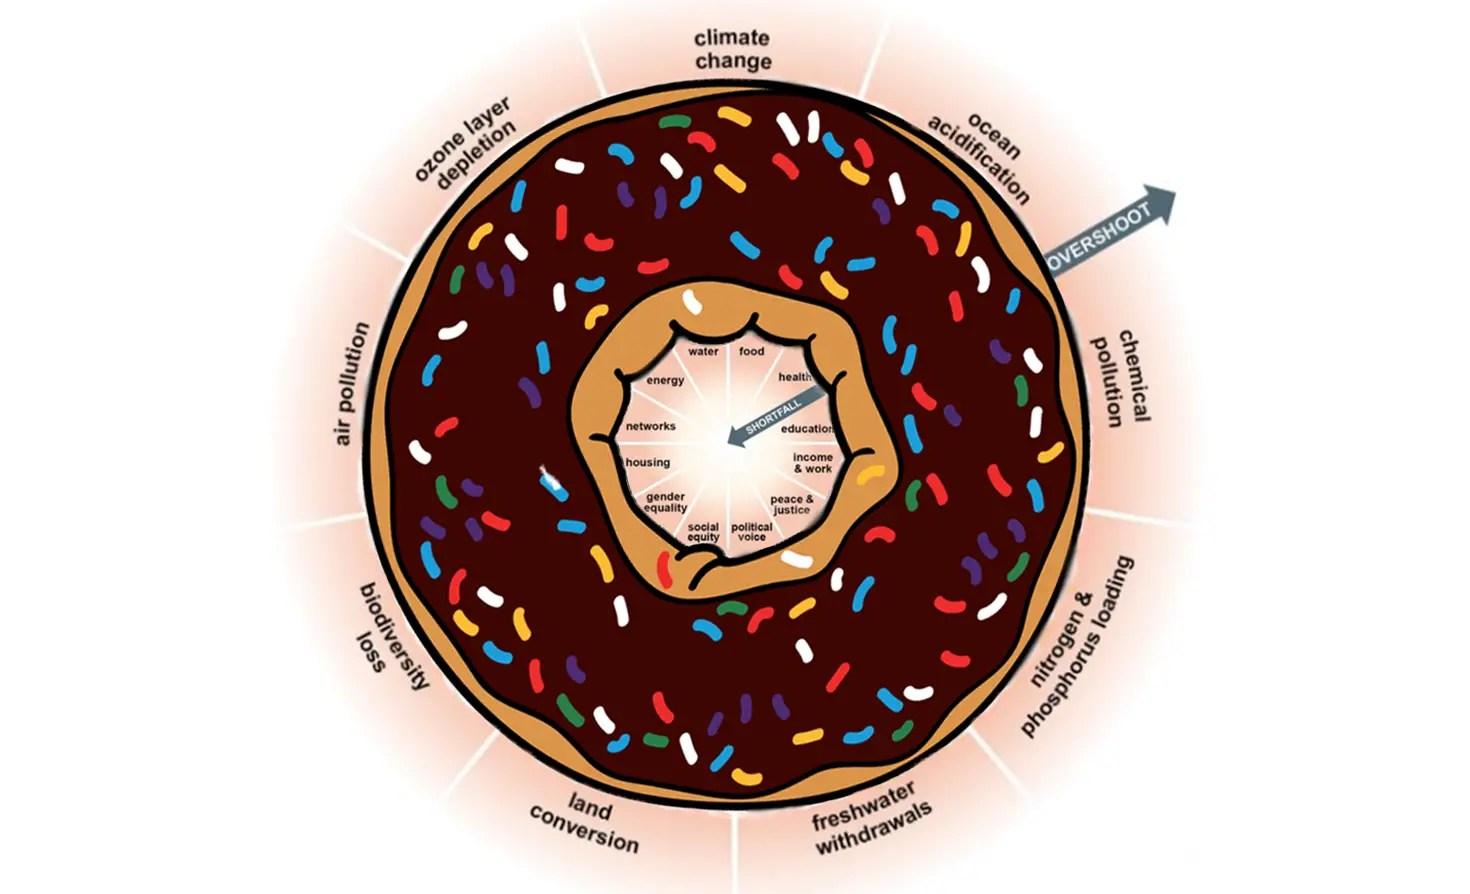 amsterdam doughnut model